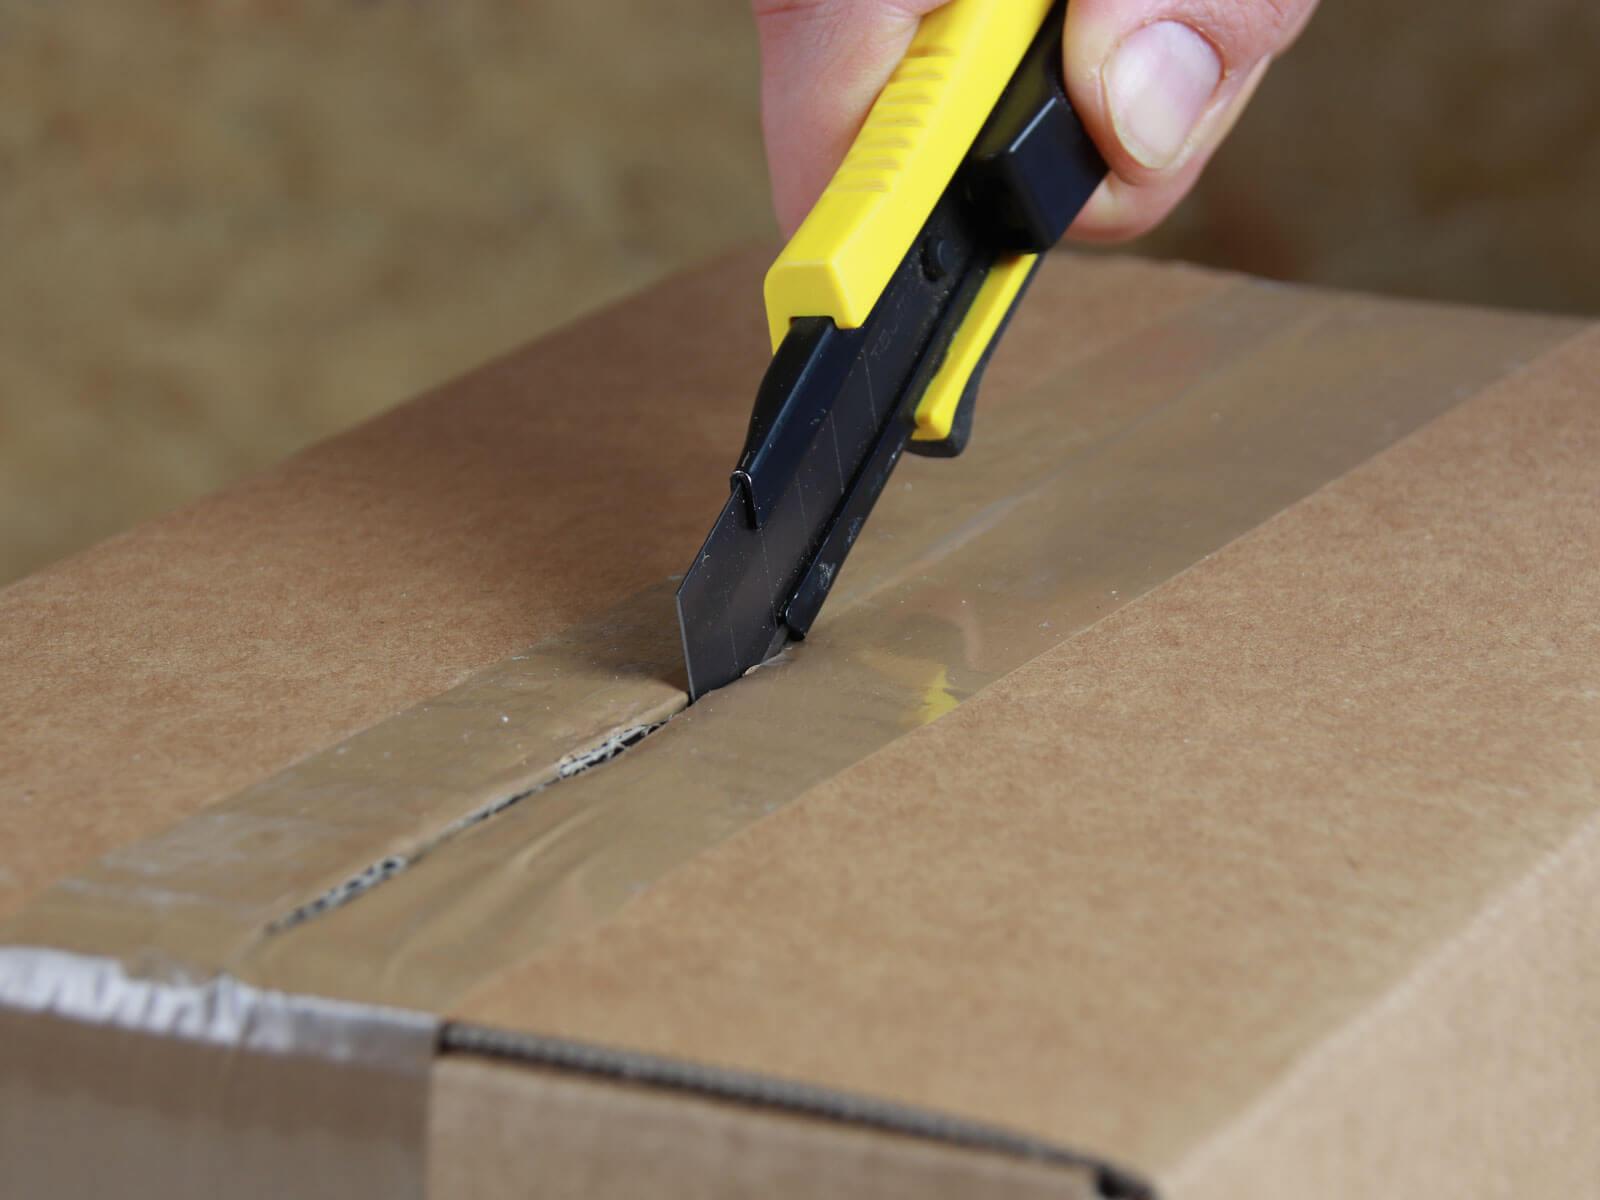 U006 Cuttermesser automatischer Klingenrückzug Klebeband schneiden CURT-tools